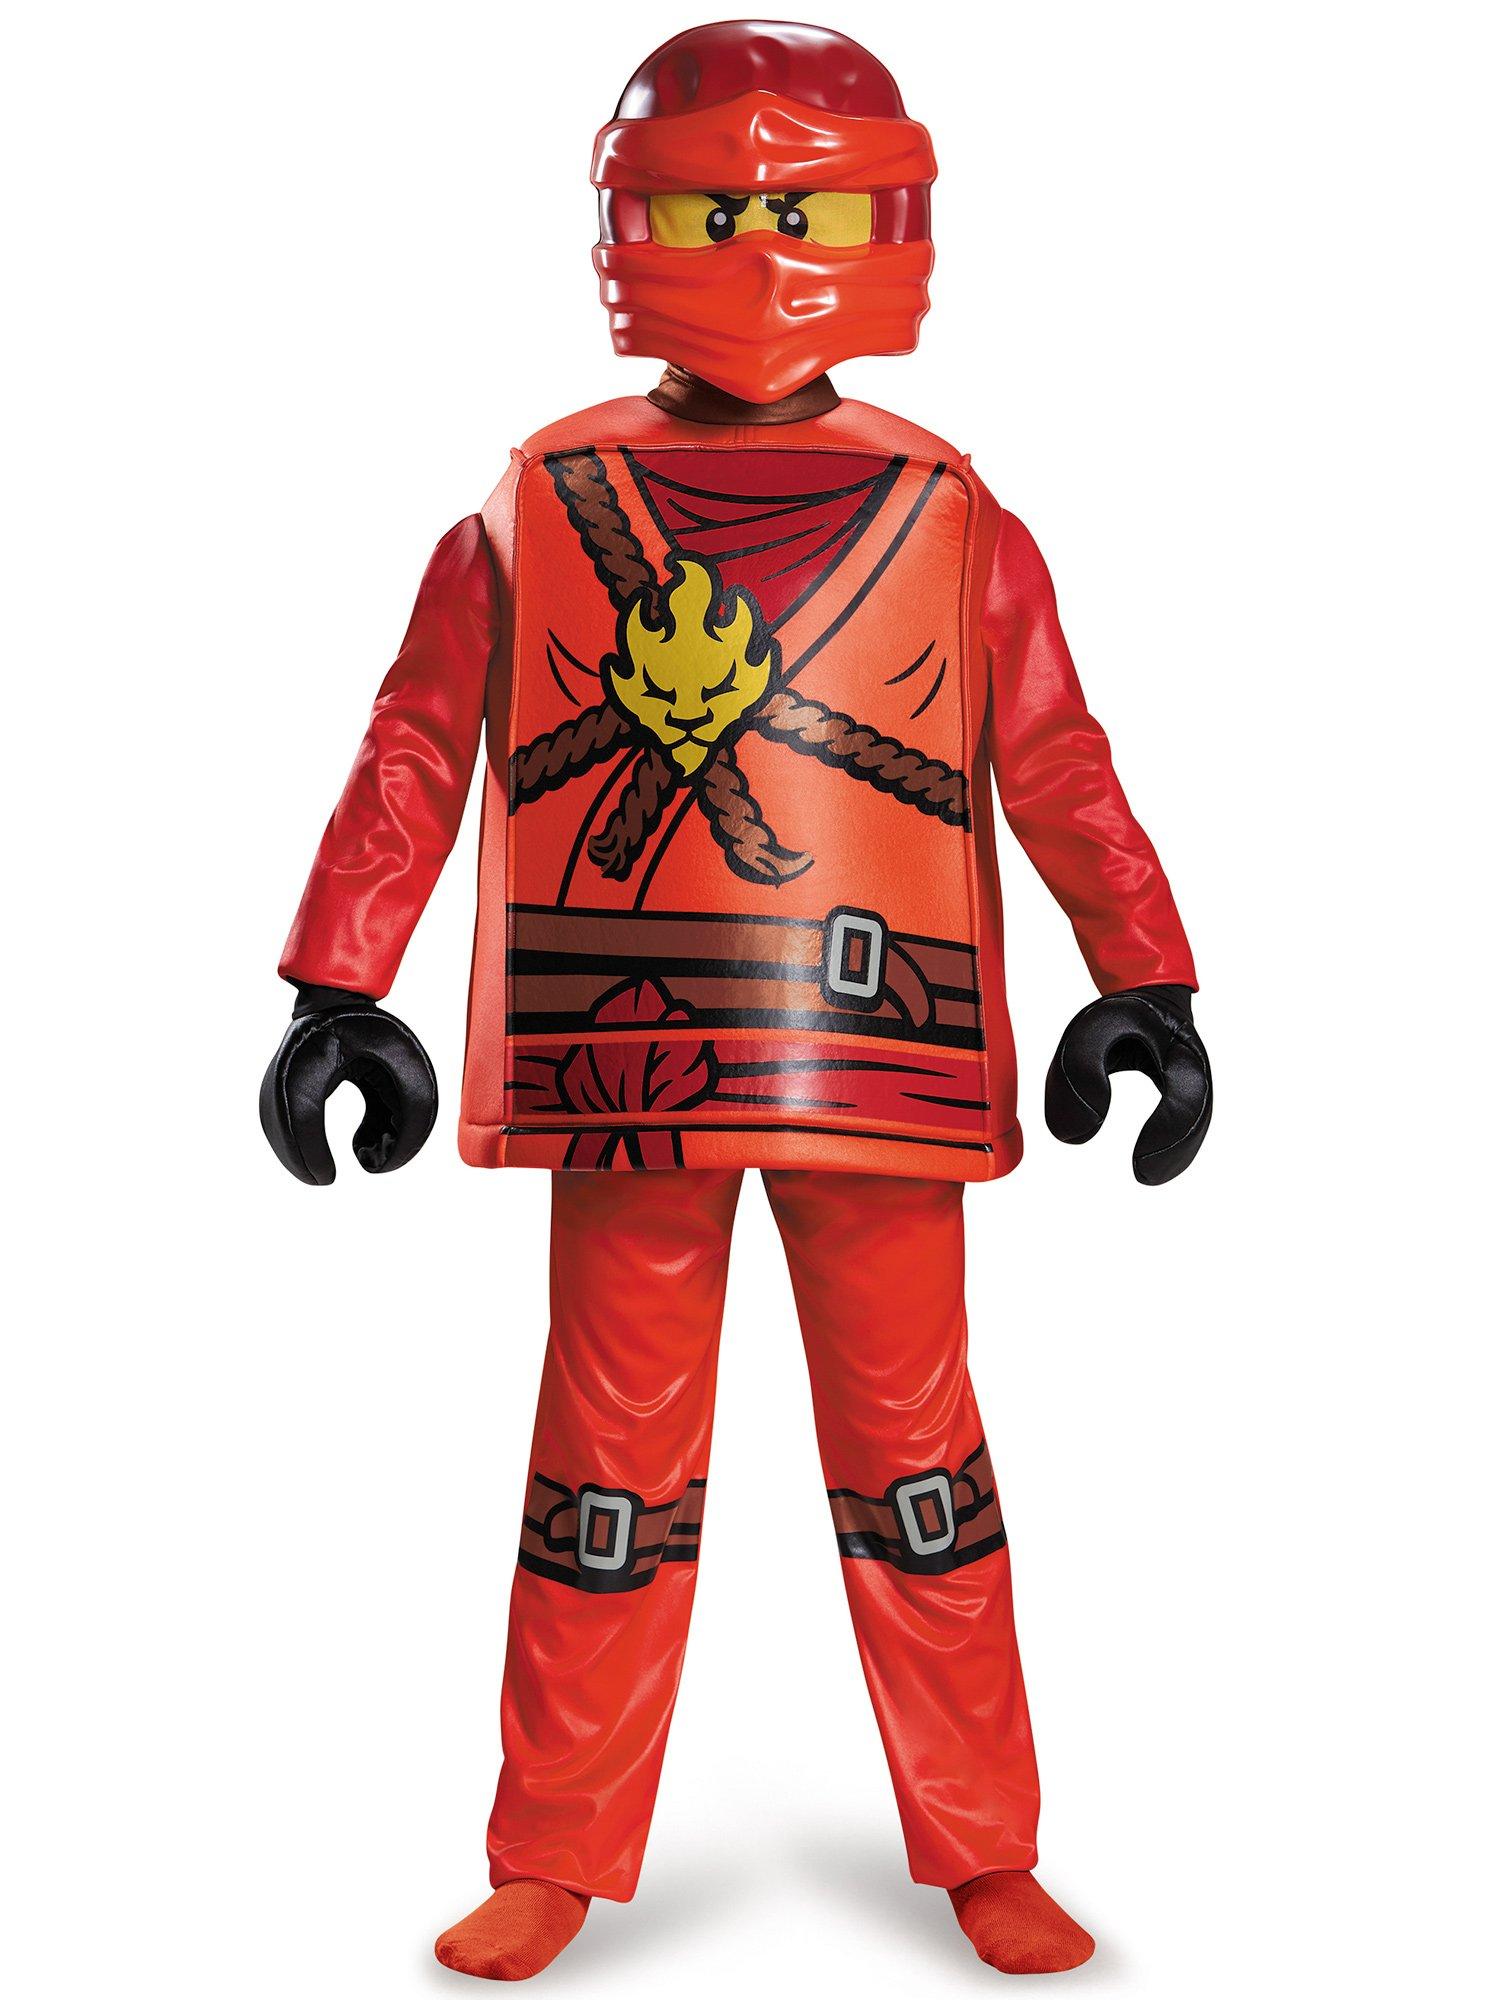 Kai Deluxe Ninjago Lego Costume, Small/4-6